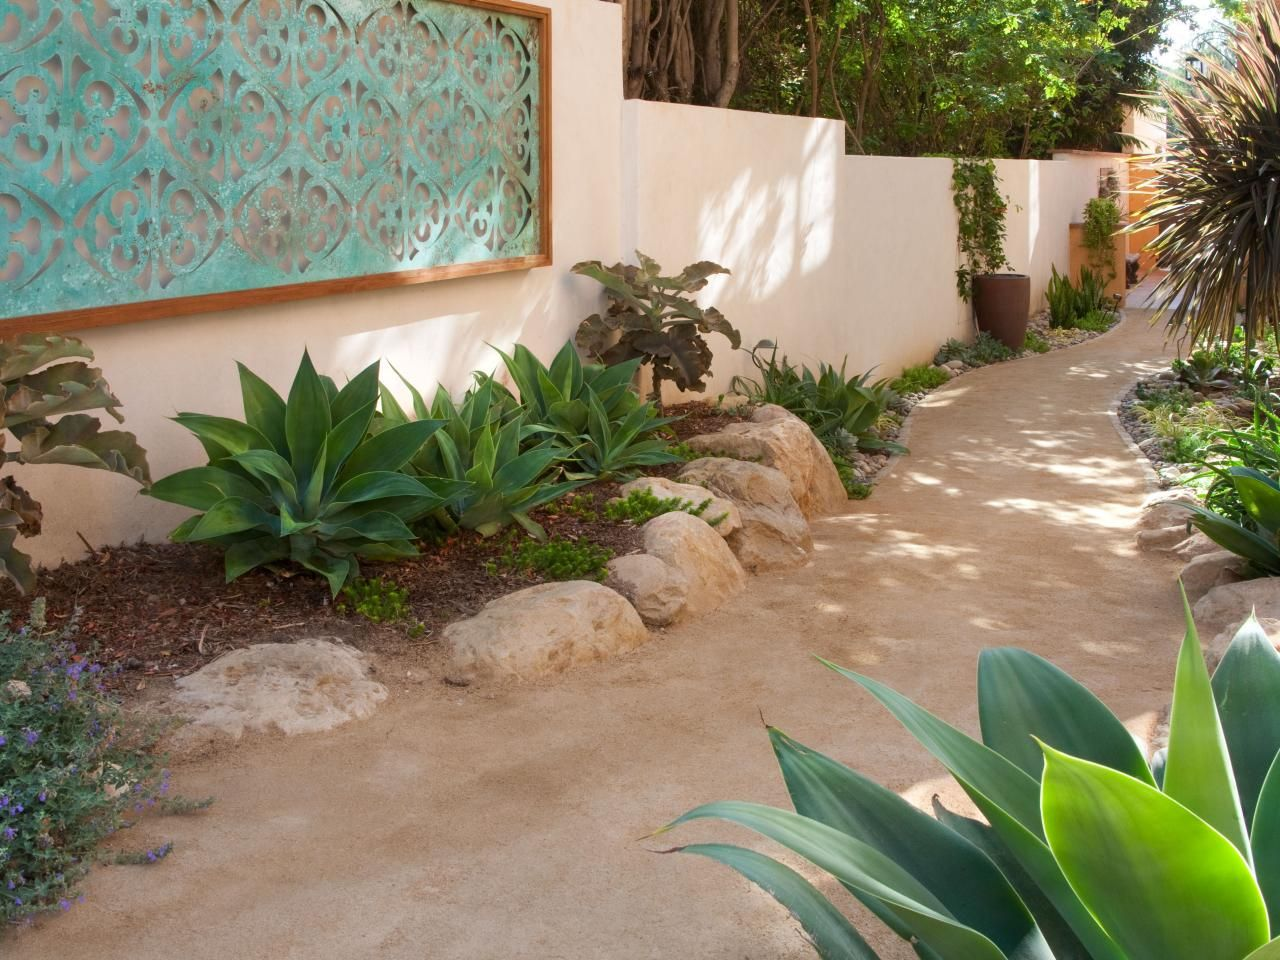 Pictures of garden pathways and walkways | Gardening Ideas ...